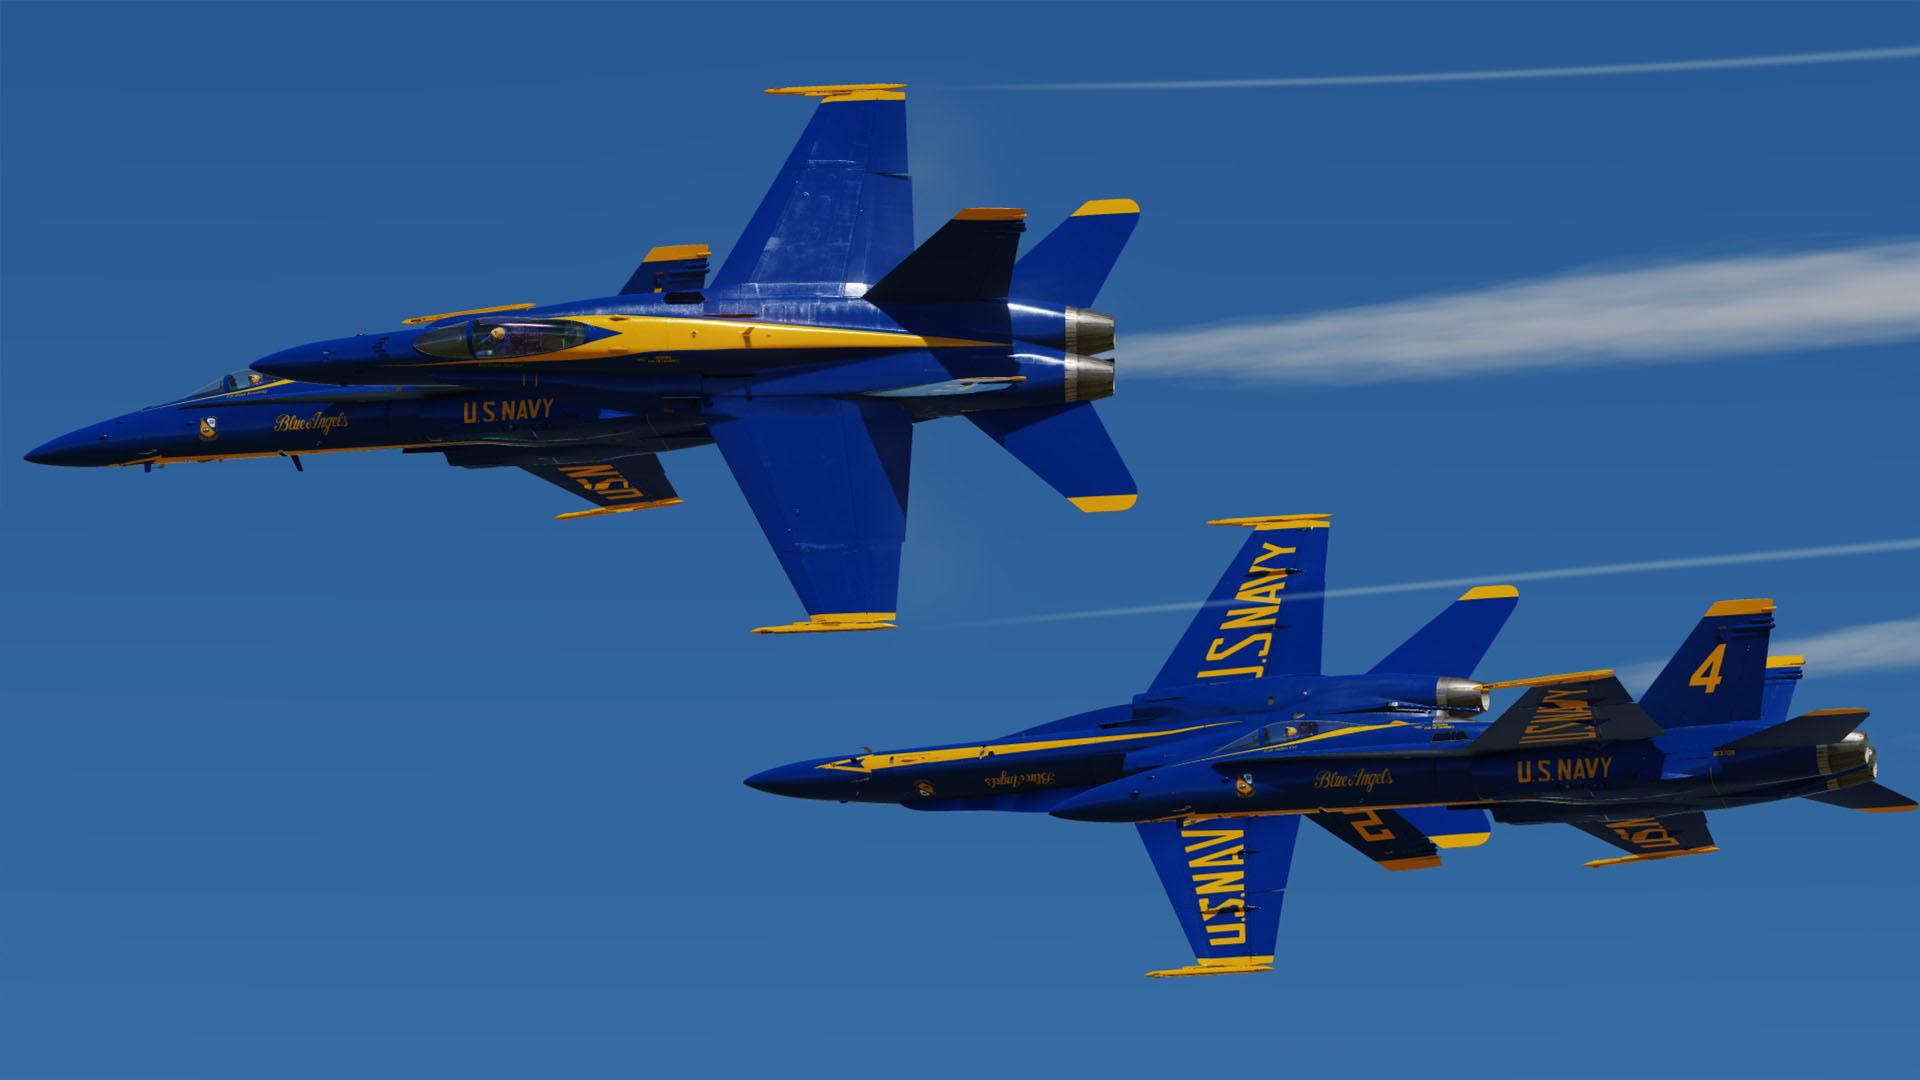 Обои Blue angels, Speed, wallpapers, navy. Авиация foto 9